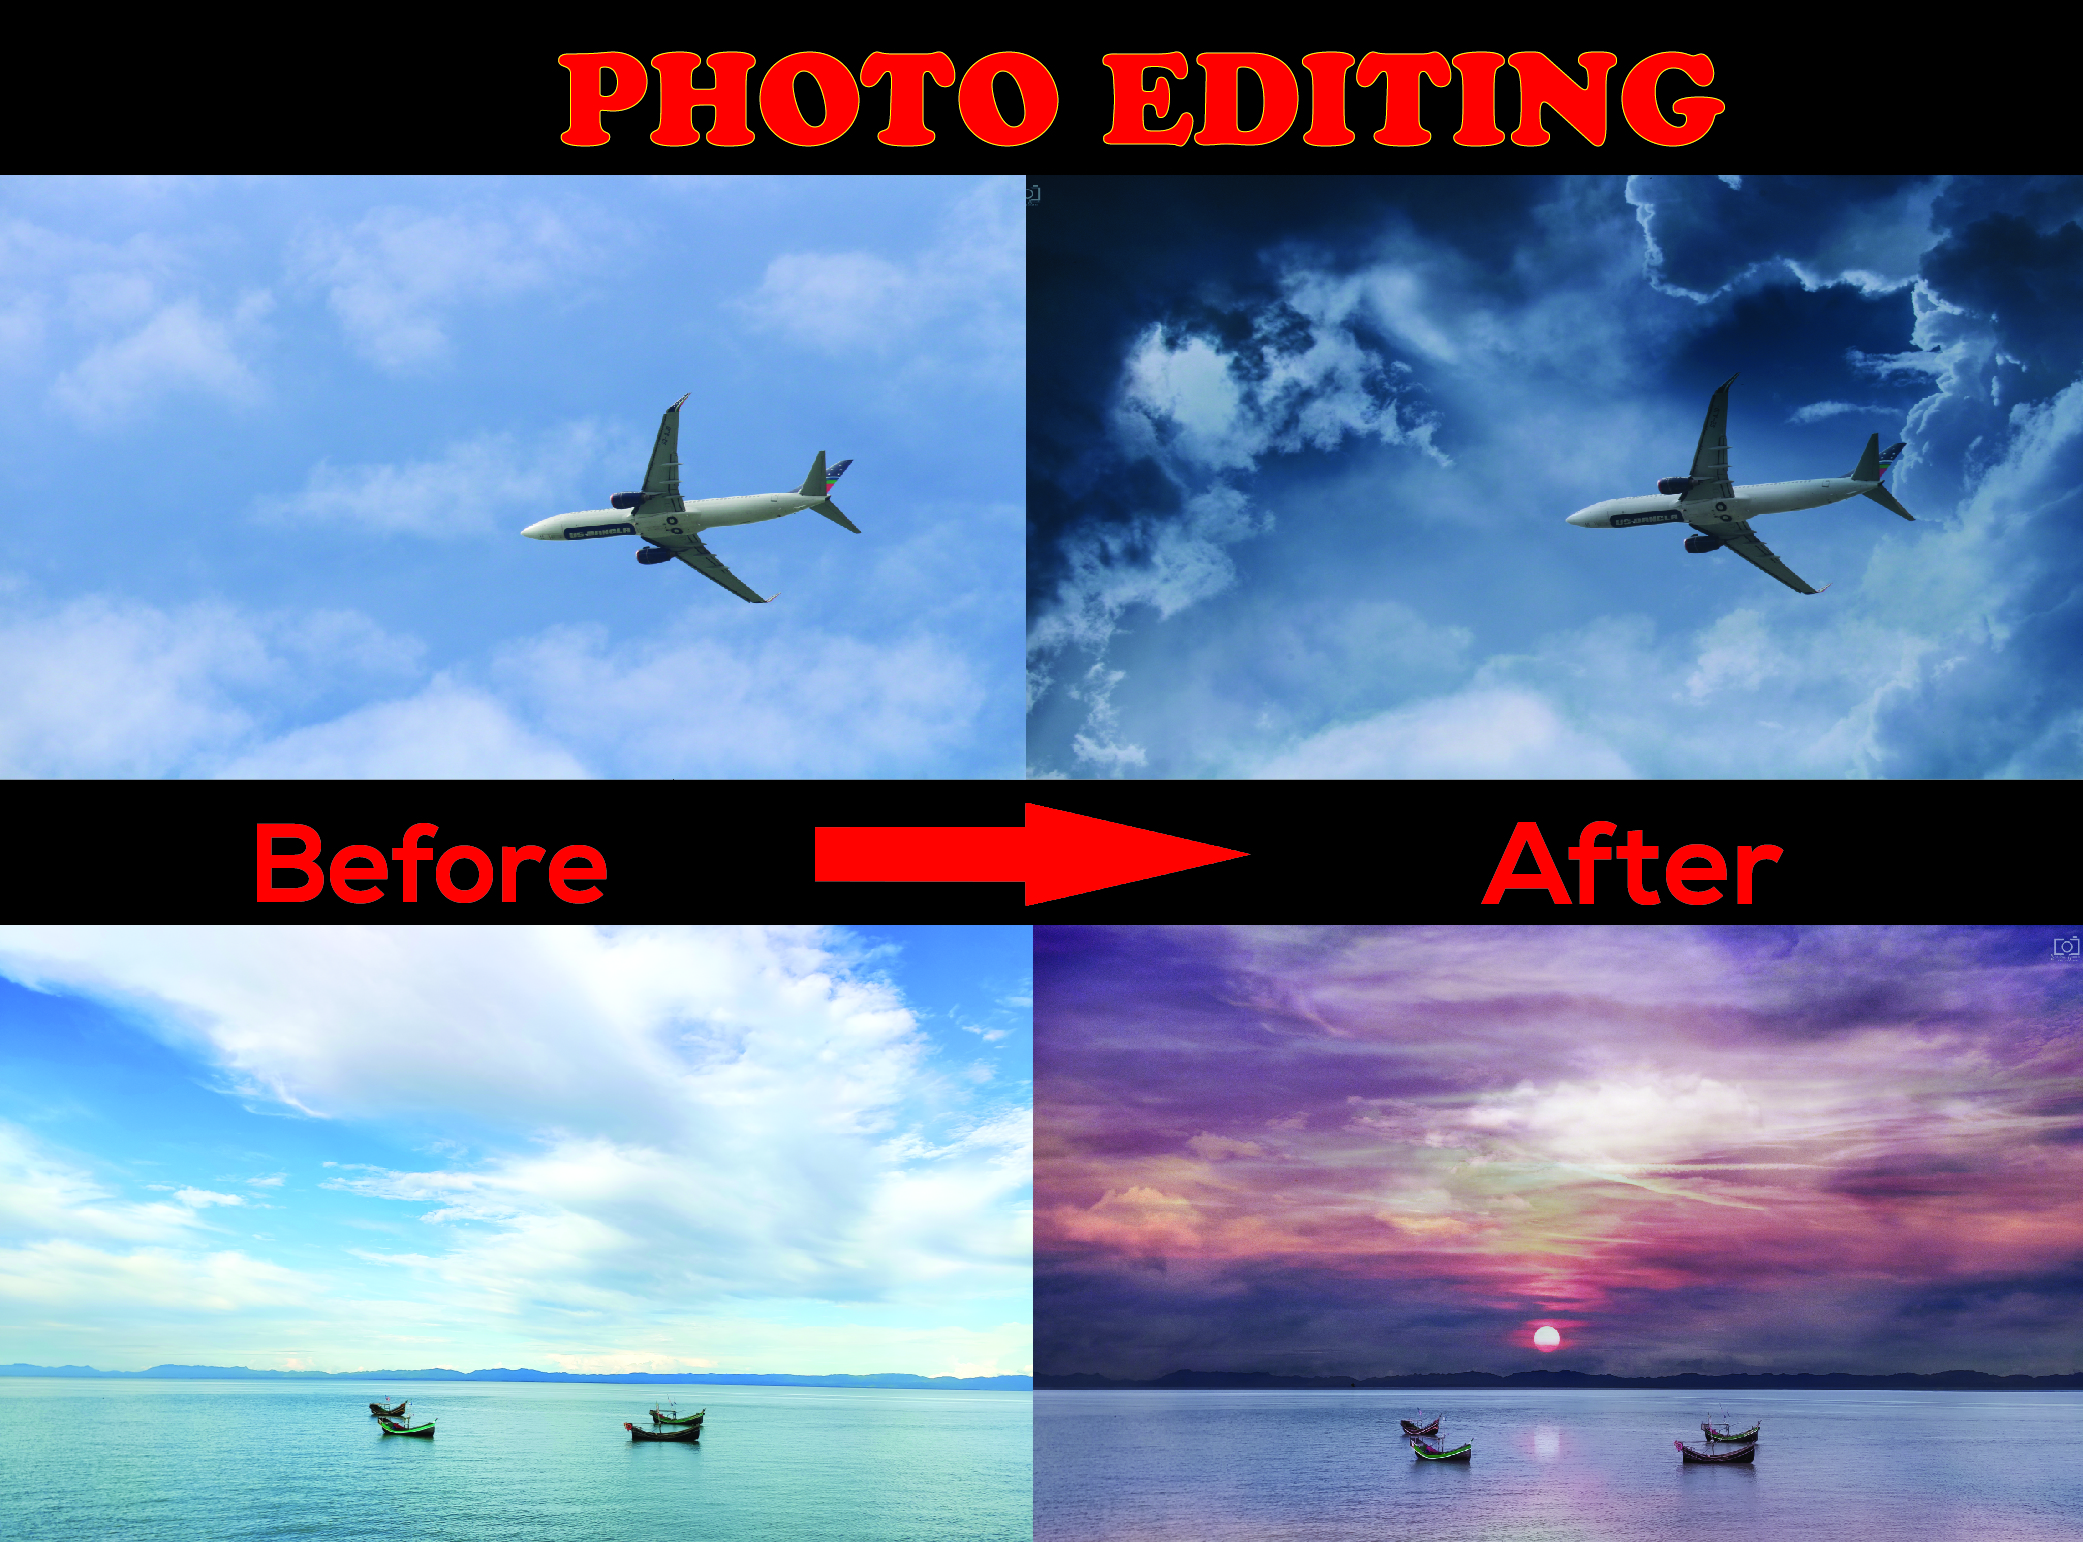 I will do image manipulation and editing